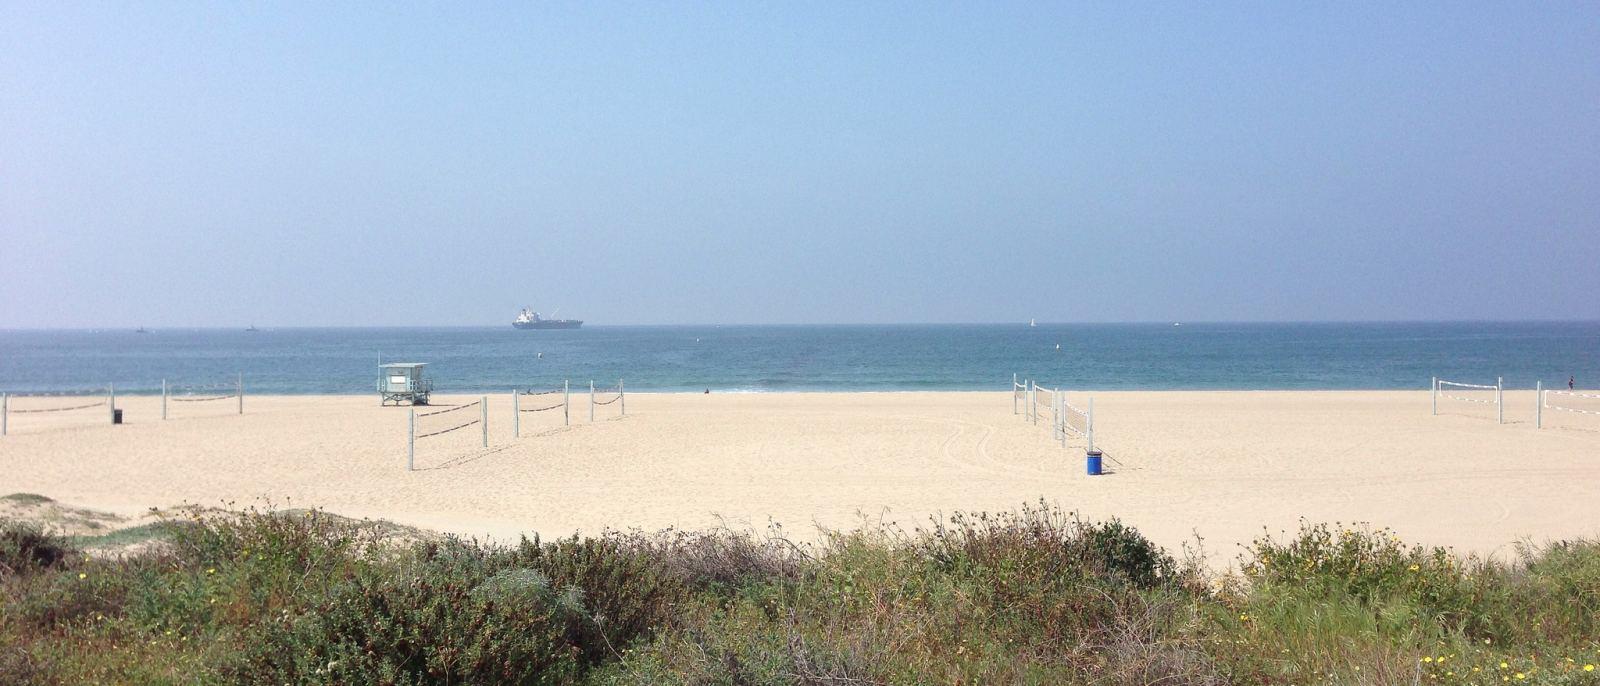 El Segundo Beach   Photo courtesy of carmenmitchell, Flickr